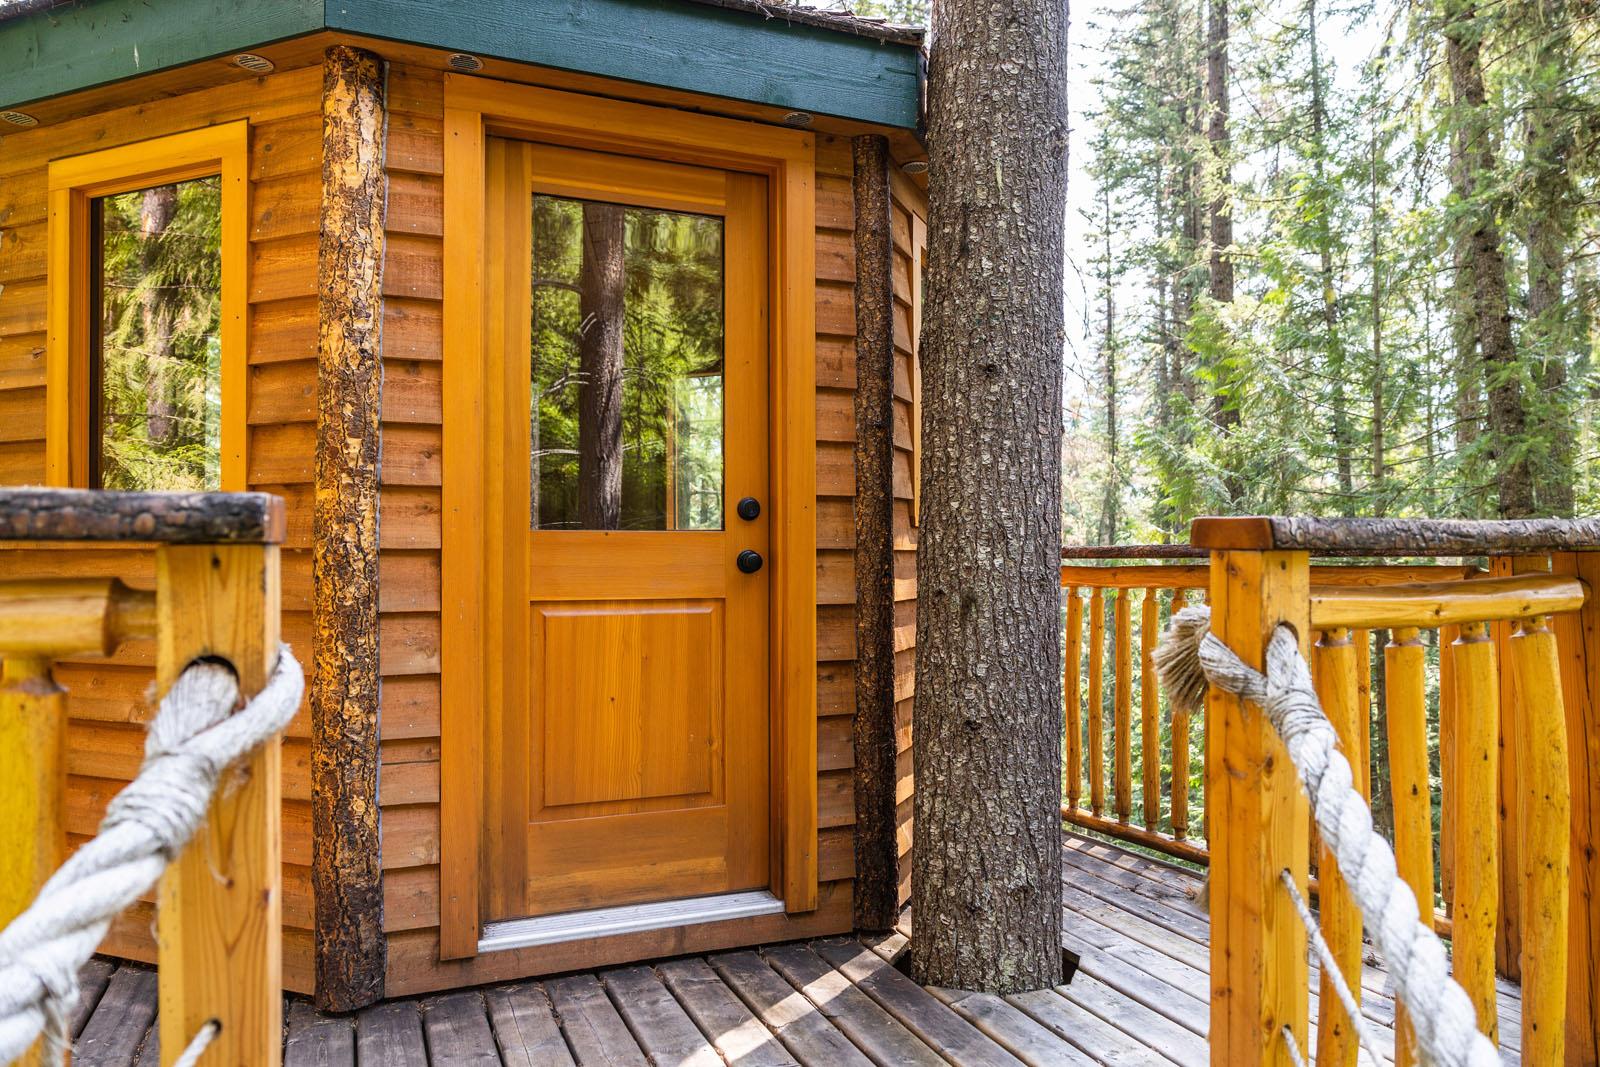 Mount robson log home 35